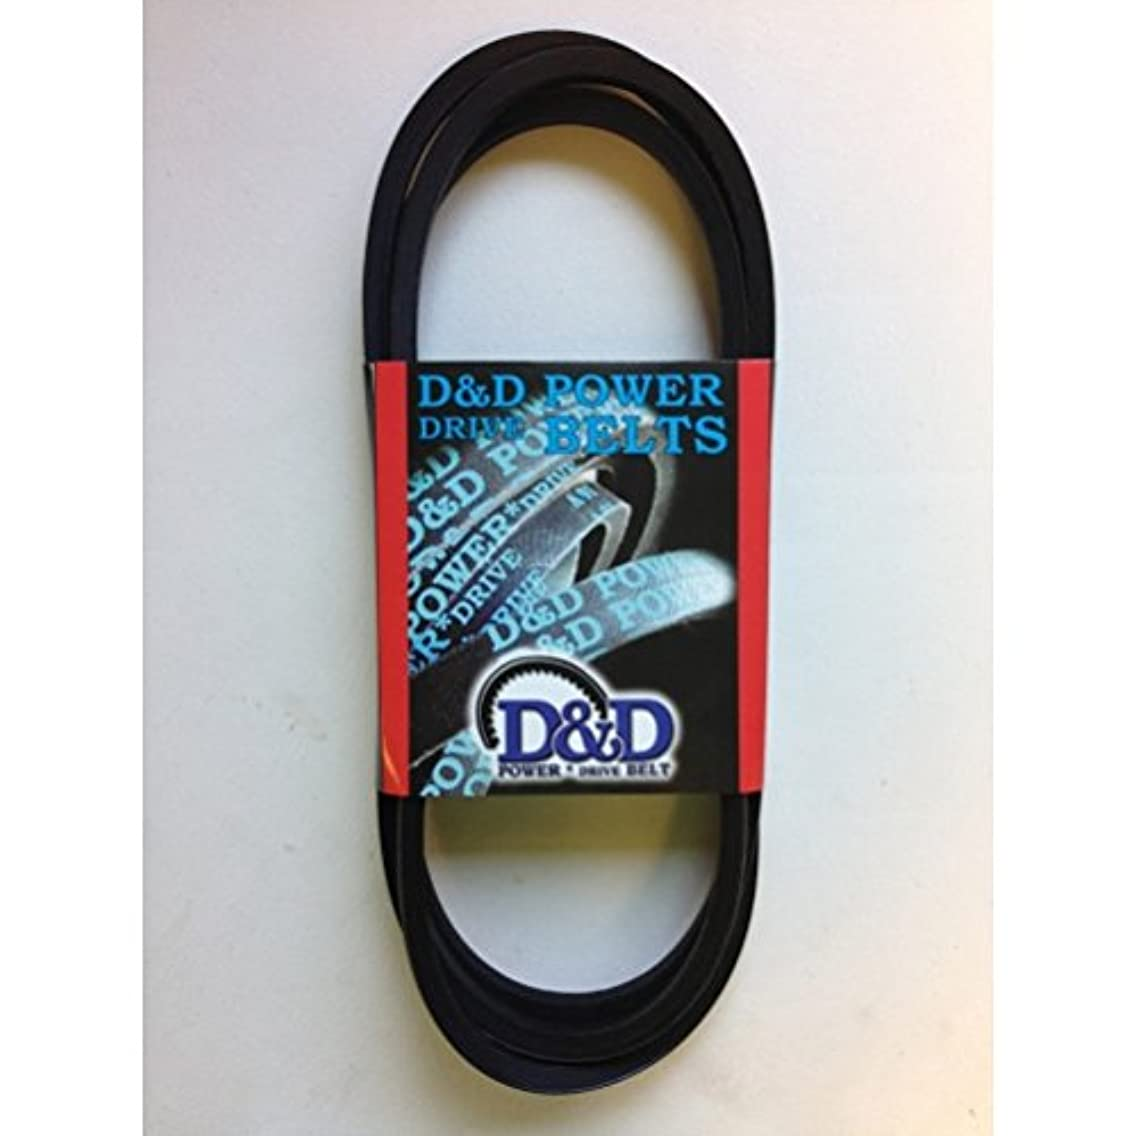 D&D PowerDrive KK5705475AR27 General Electric Replacement Belt, 3L Belt Cross Section, 43